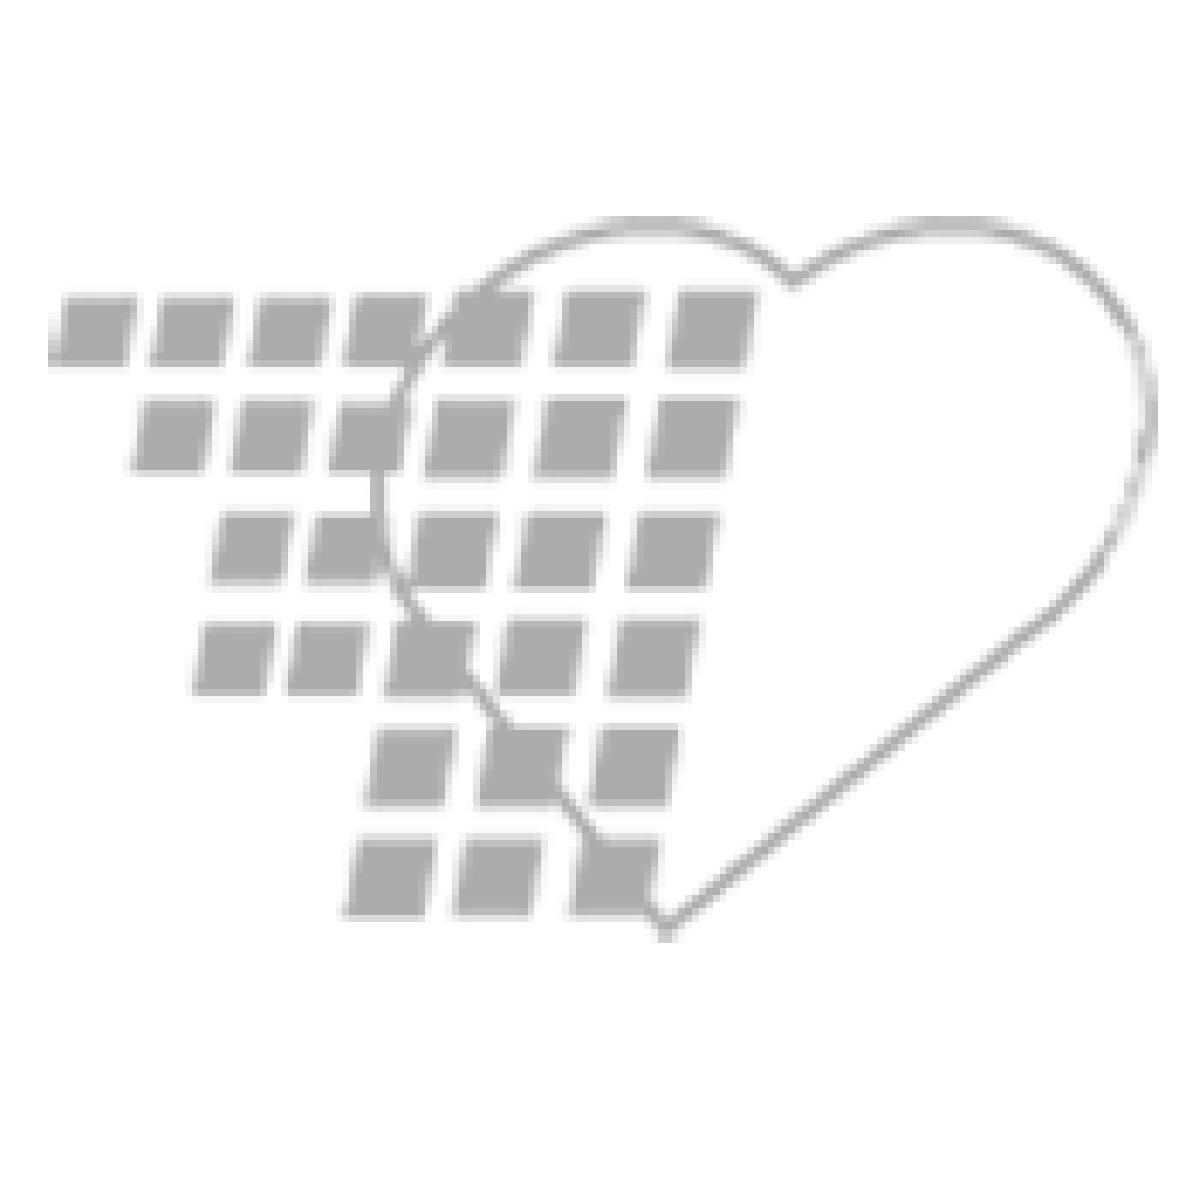 11-81-0016 SimObesityShirt™ V2